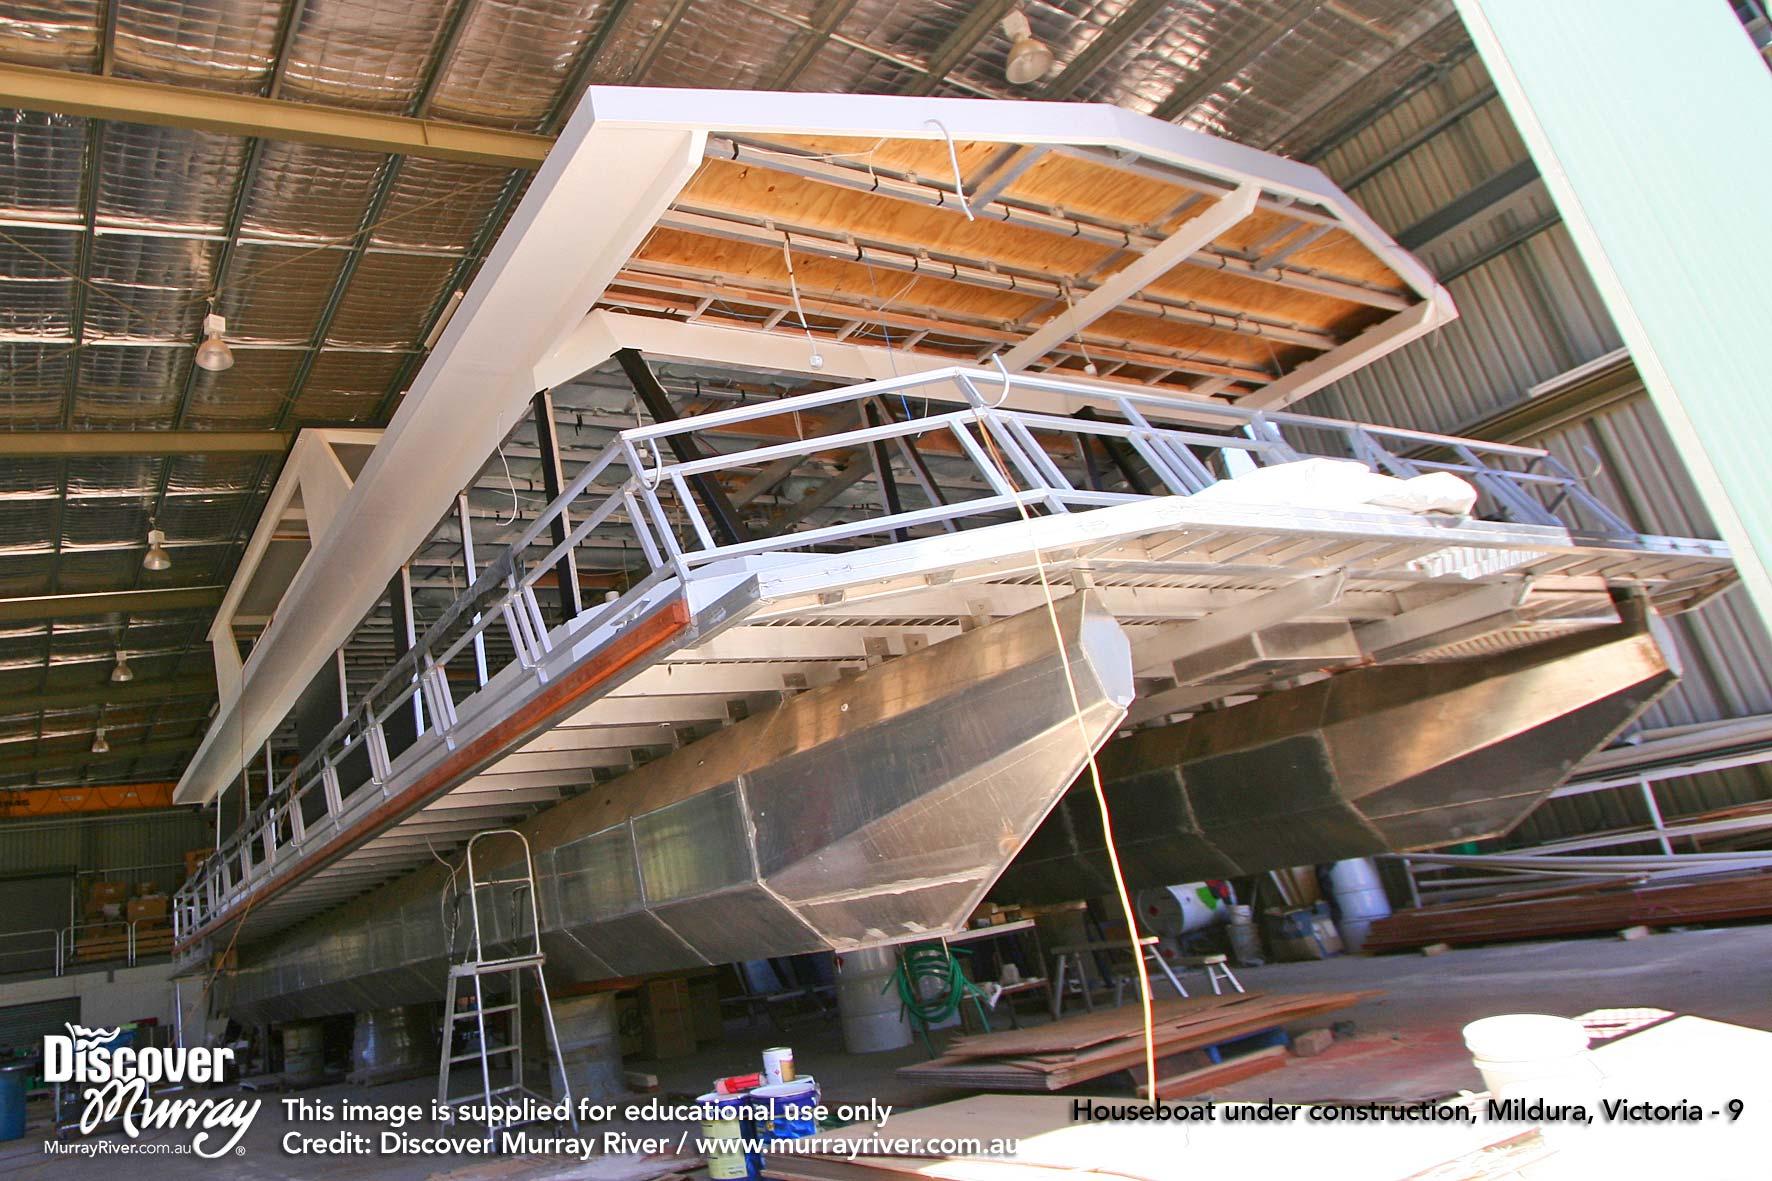 Houseboat Ferier i South Australia